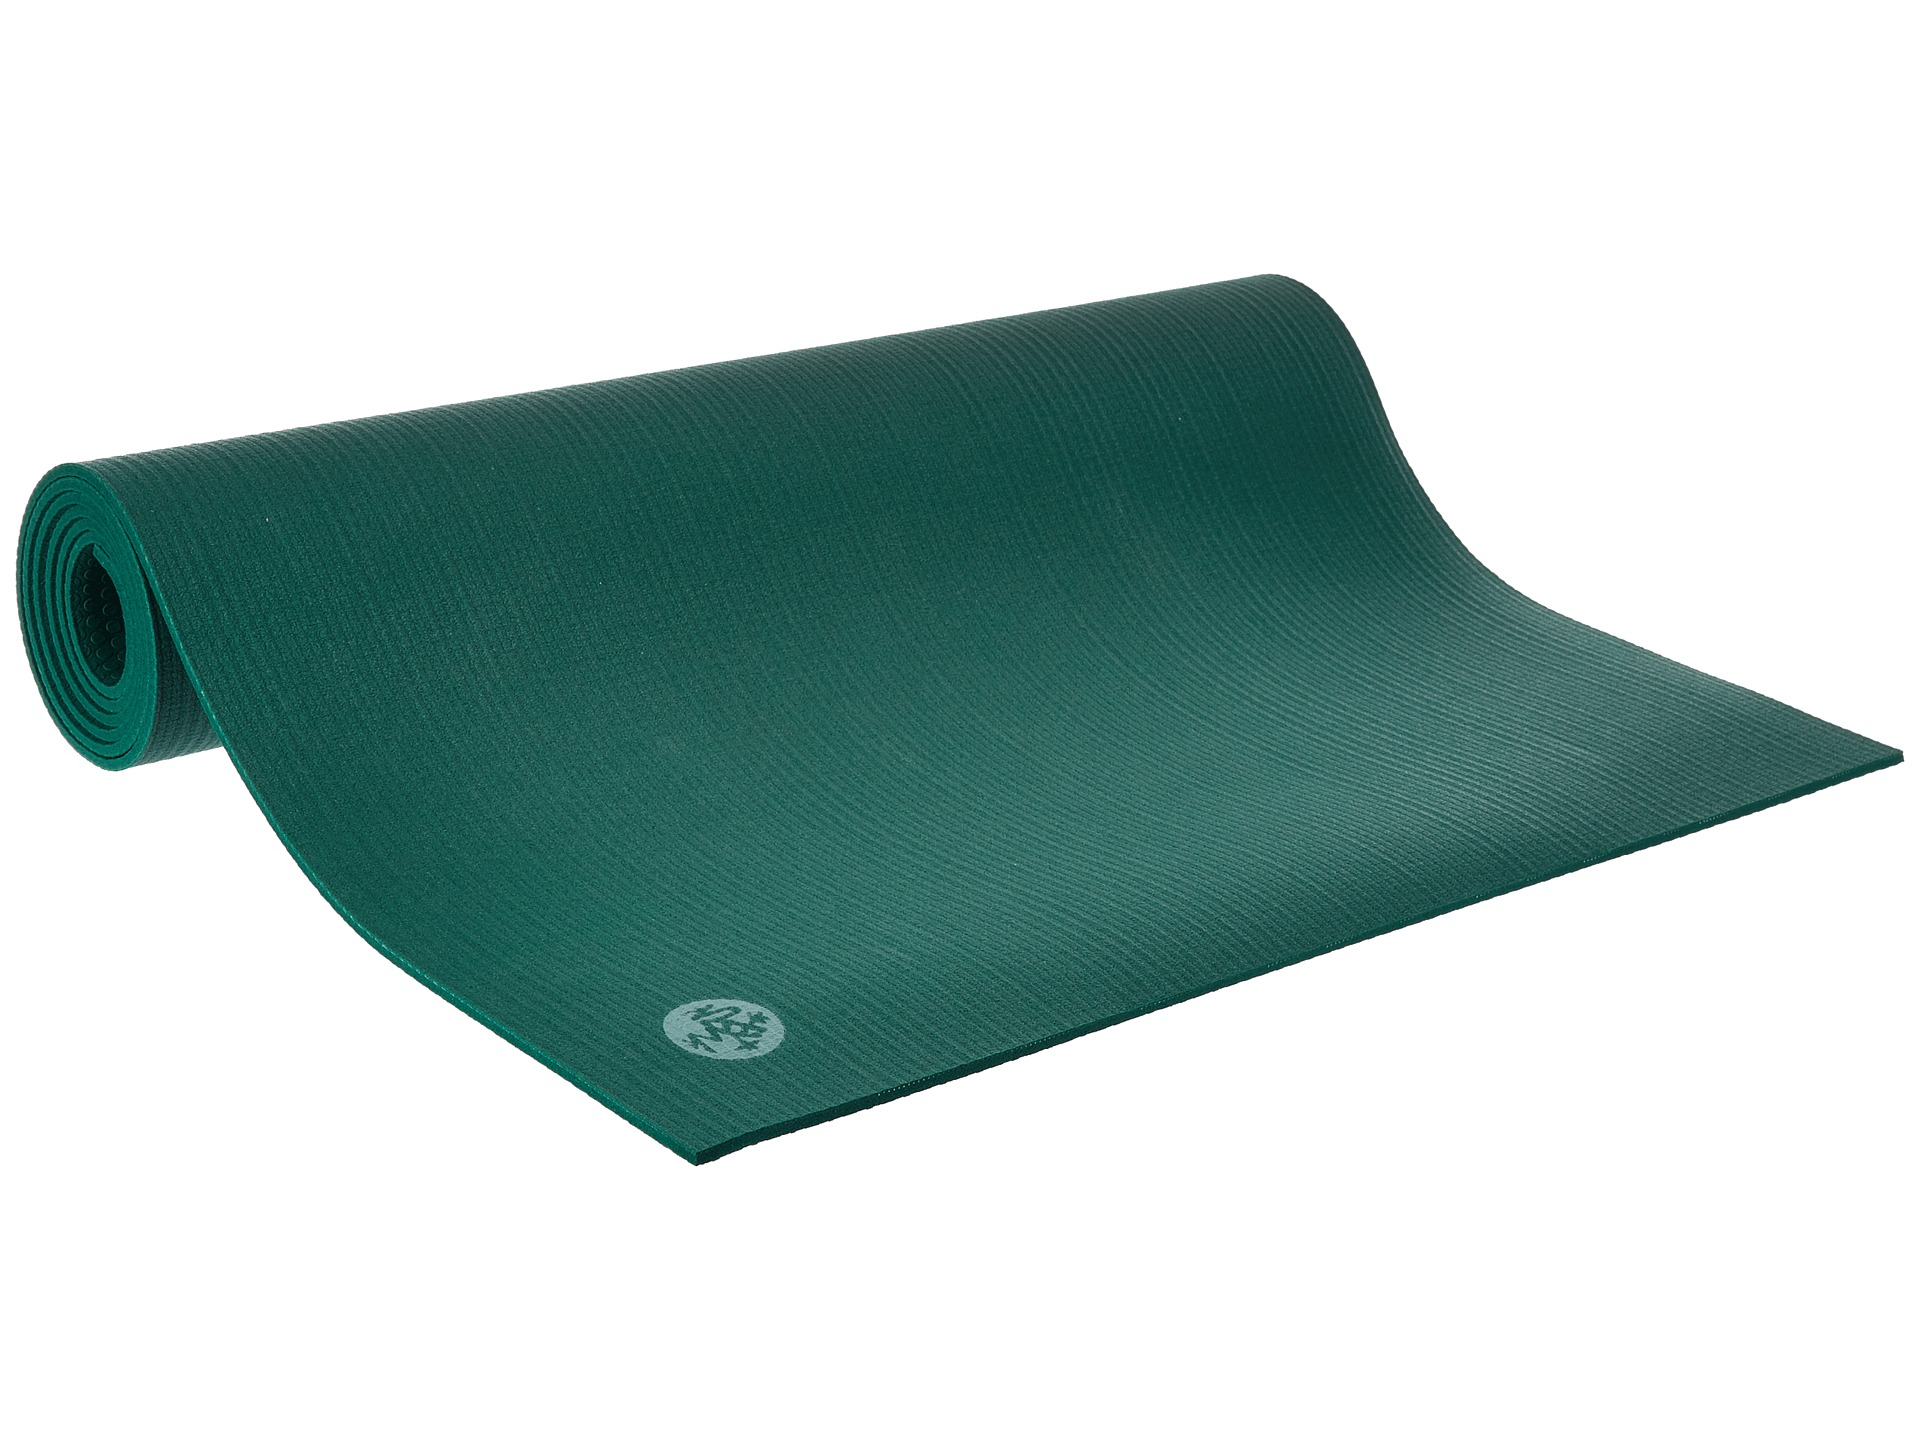 Manduka Prolite Yoga Mat Zappos Com Free Shipping Both Ways